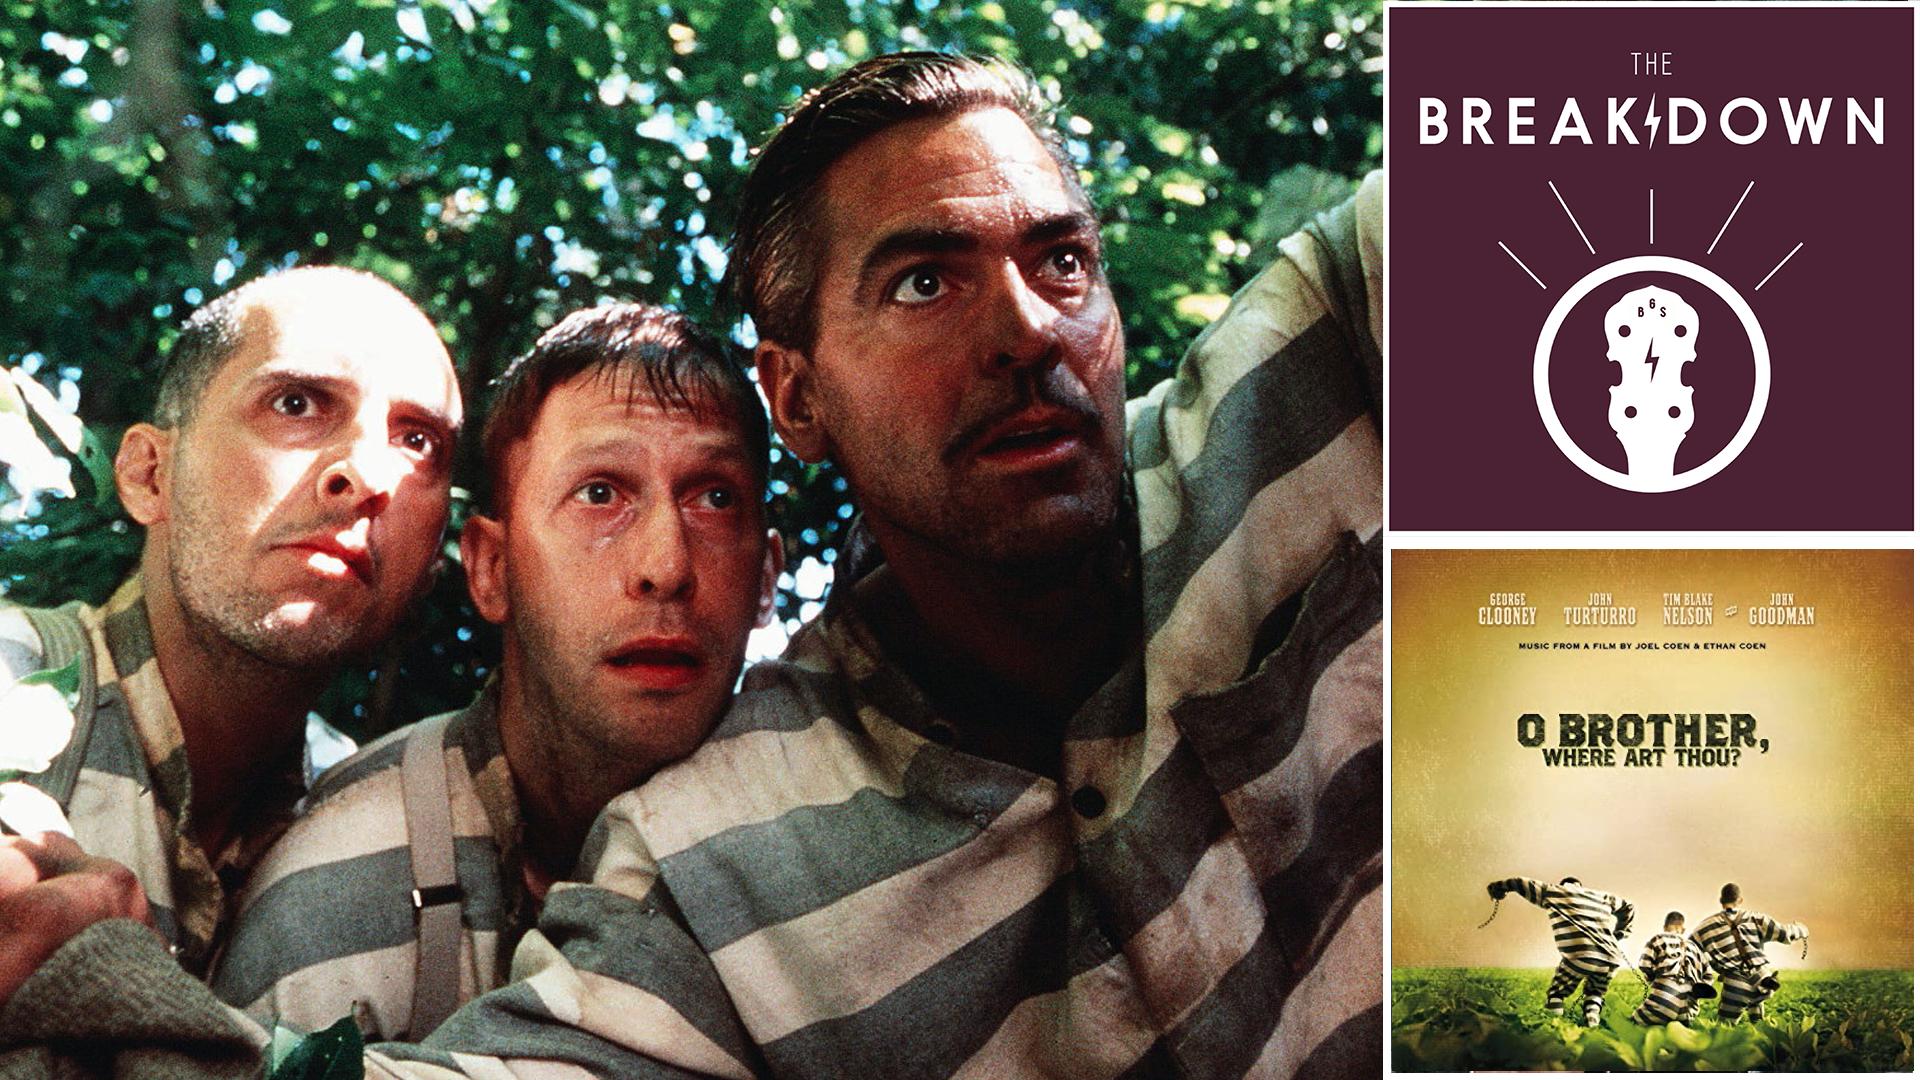 The Breakdown – 'O Brother, Where Art Thou?'